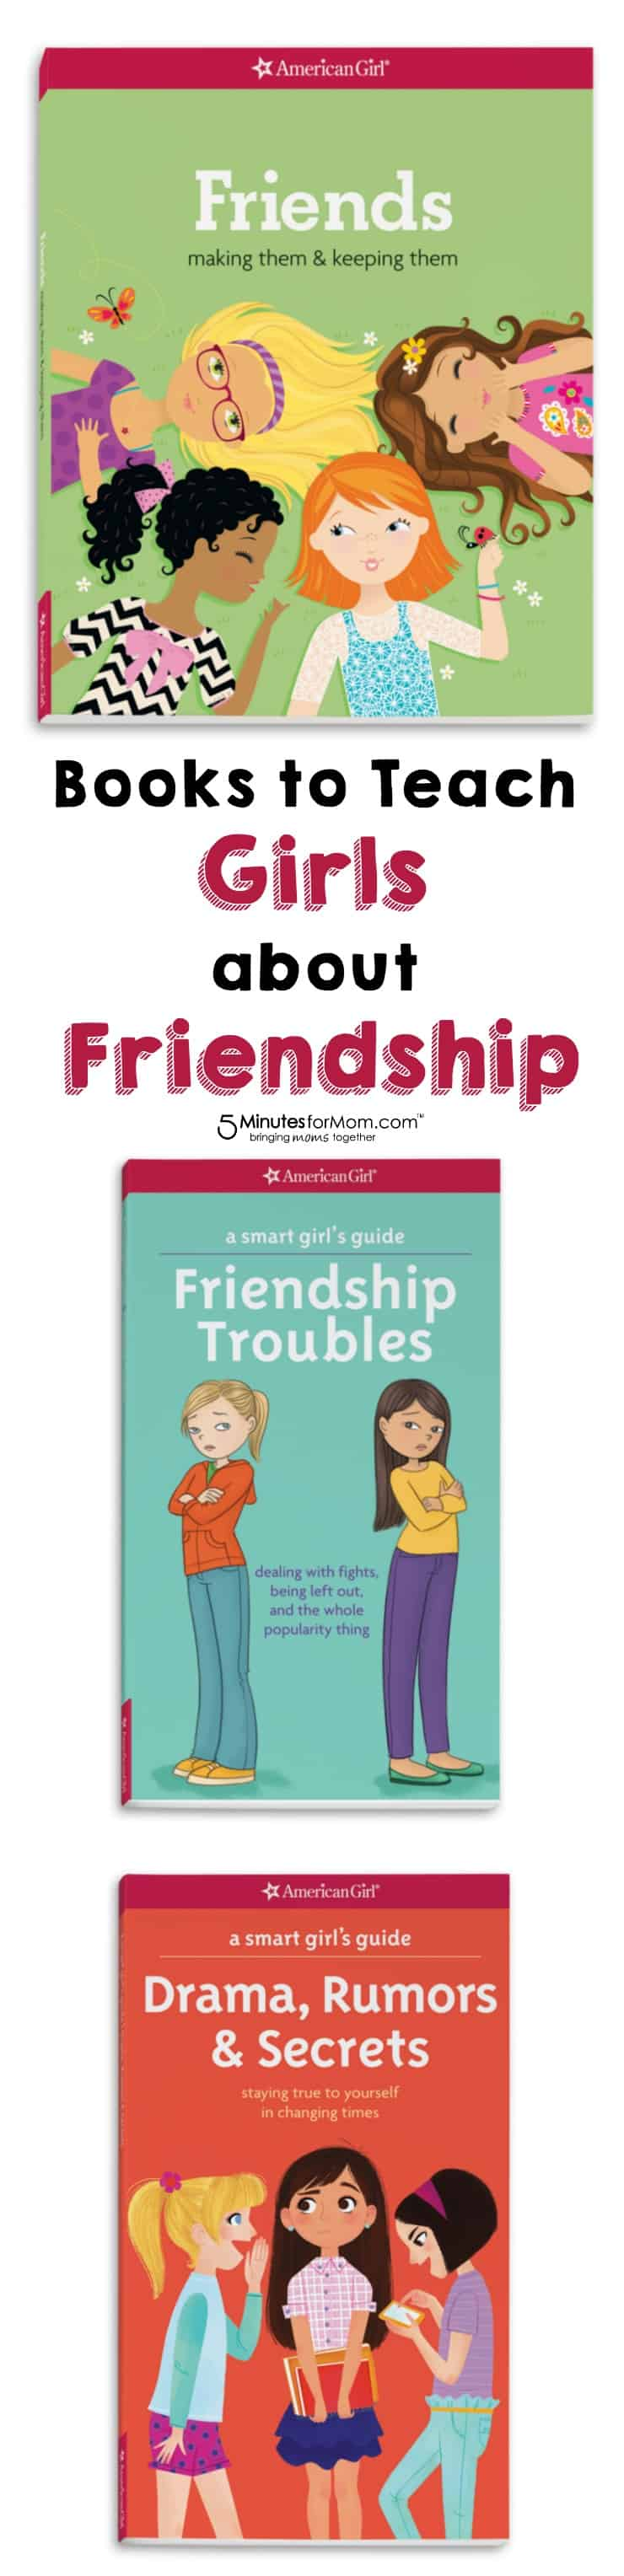 Books to Teach Girls about Friendship